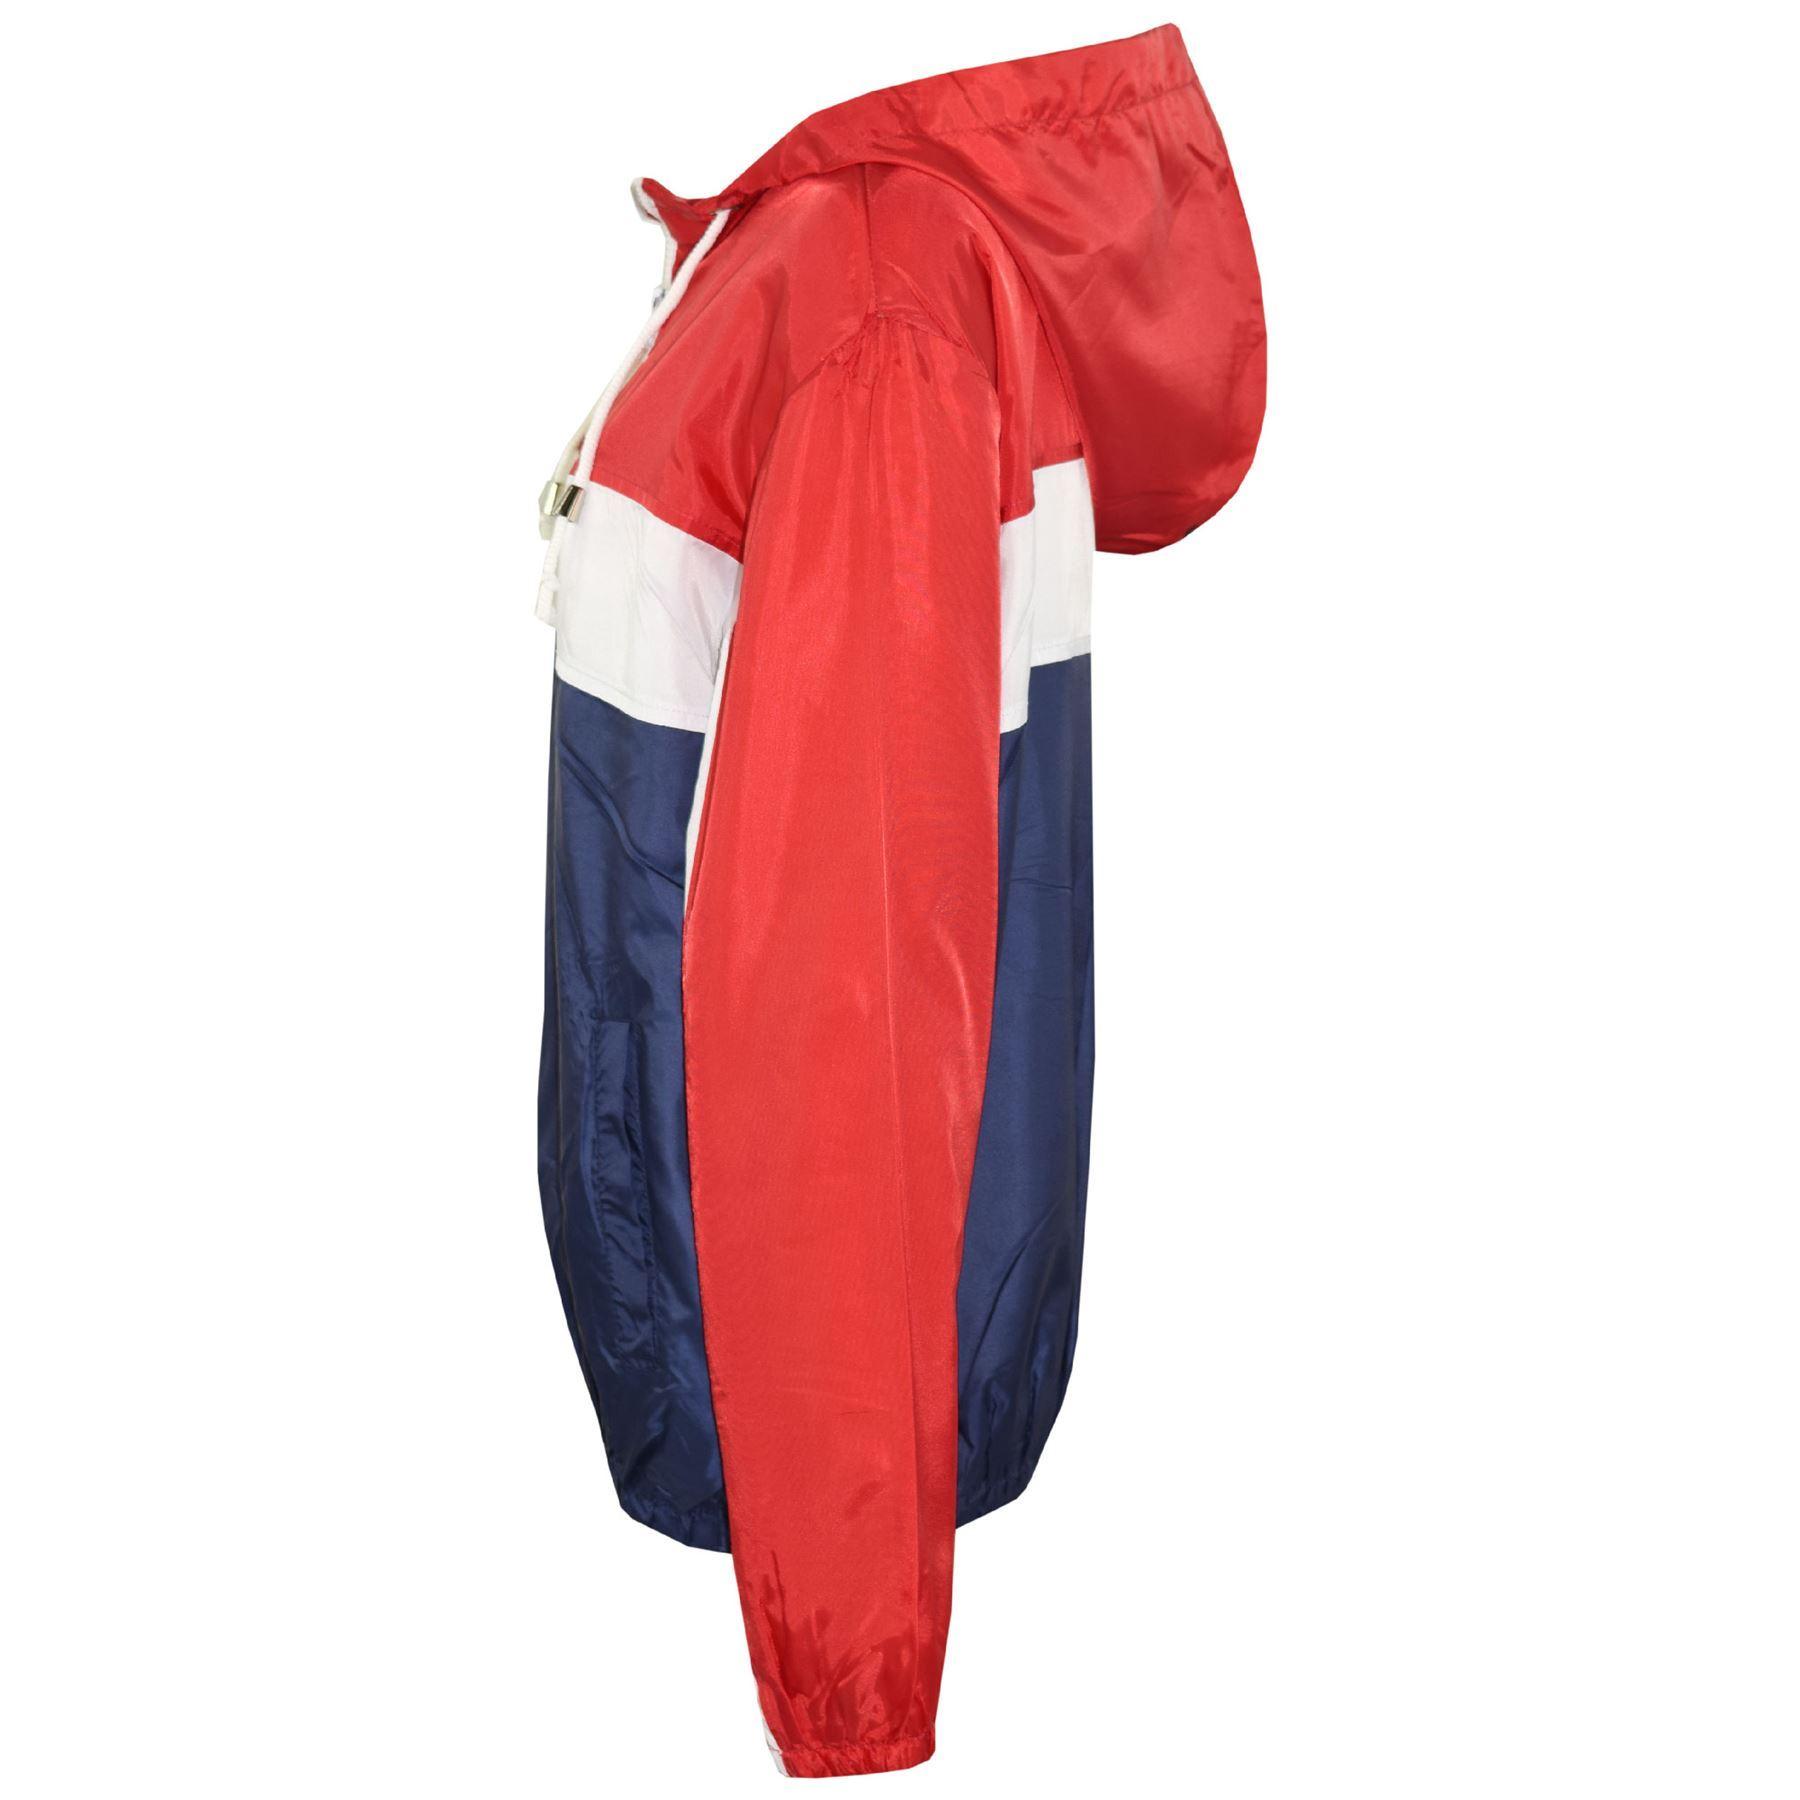 Kids-Boys-Girls-Windbreaker-Contrast-Block-Hooded-Jackets-Rain-Mac-Raincoat-5-13 thumbnail 16